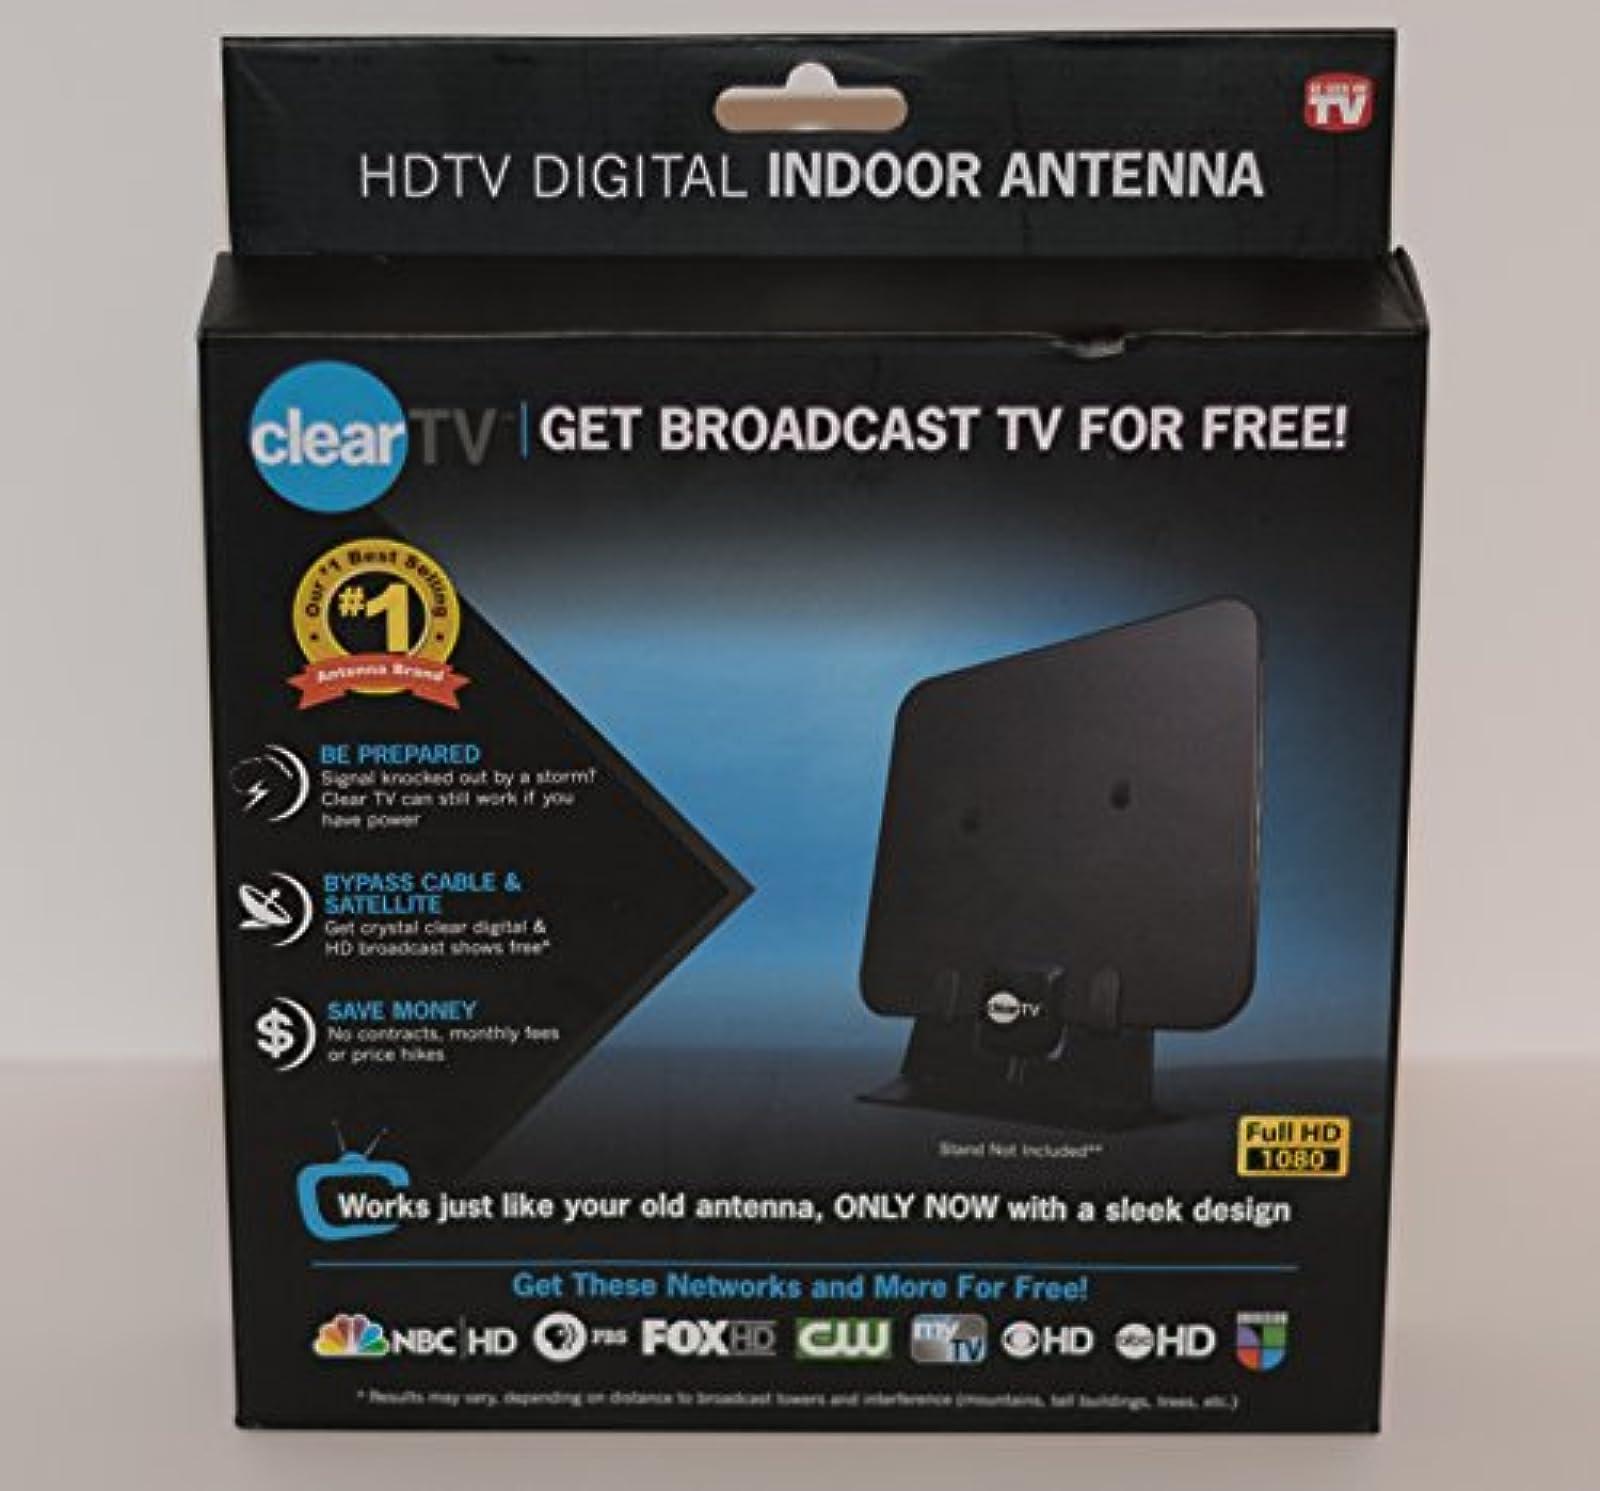 Cleartv X-72 HDTV Digital Indoor Antenna Black